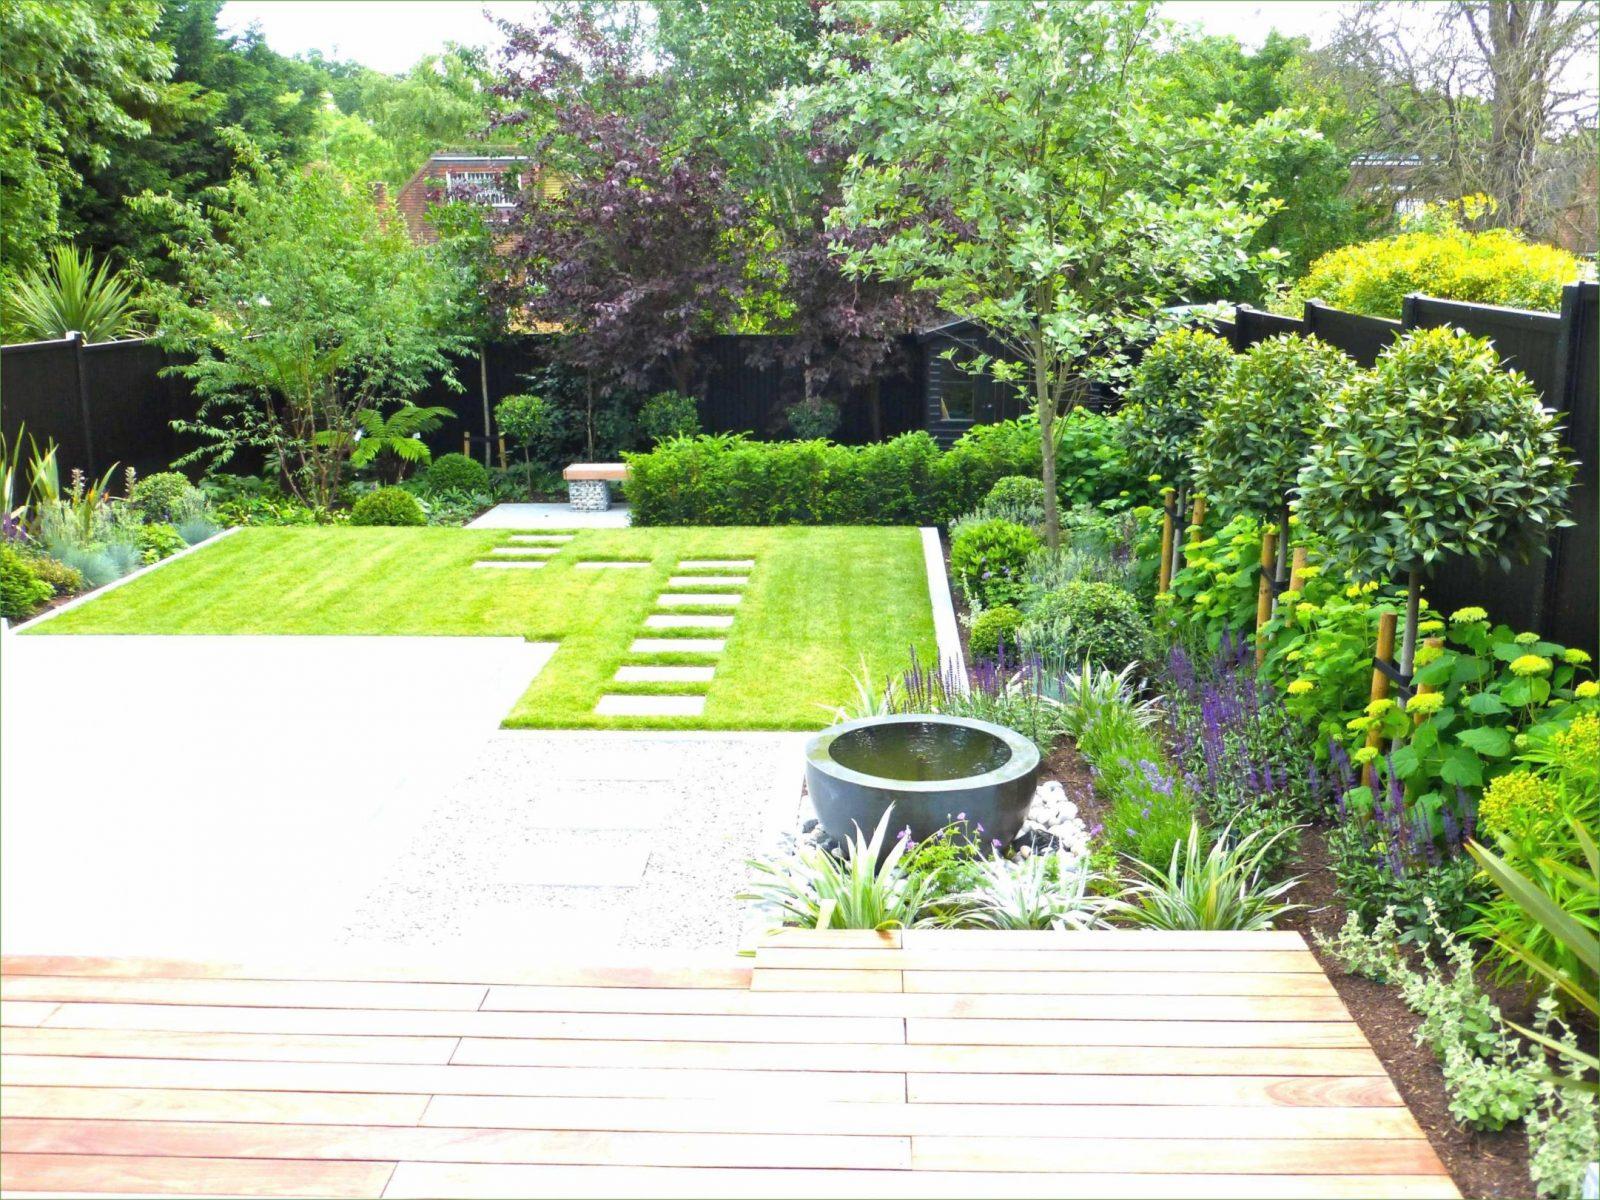 40 Genial Vorgarten Mit Kies Gestalten Bilder  Hope4Mito von Garten Mit Kies Bilder Bild